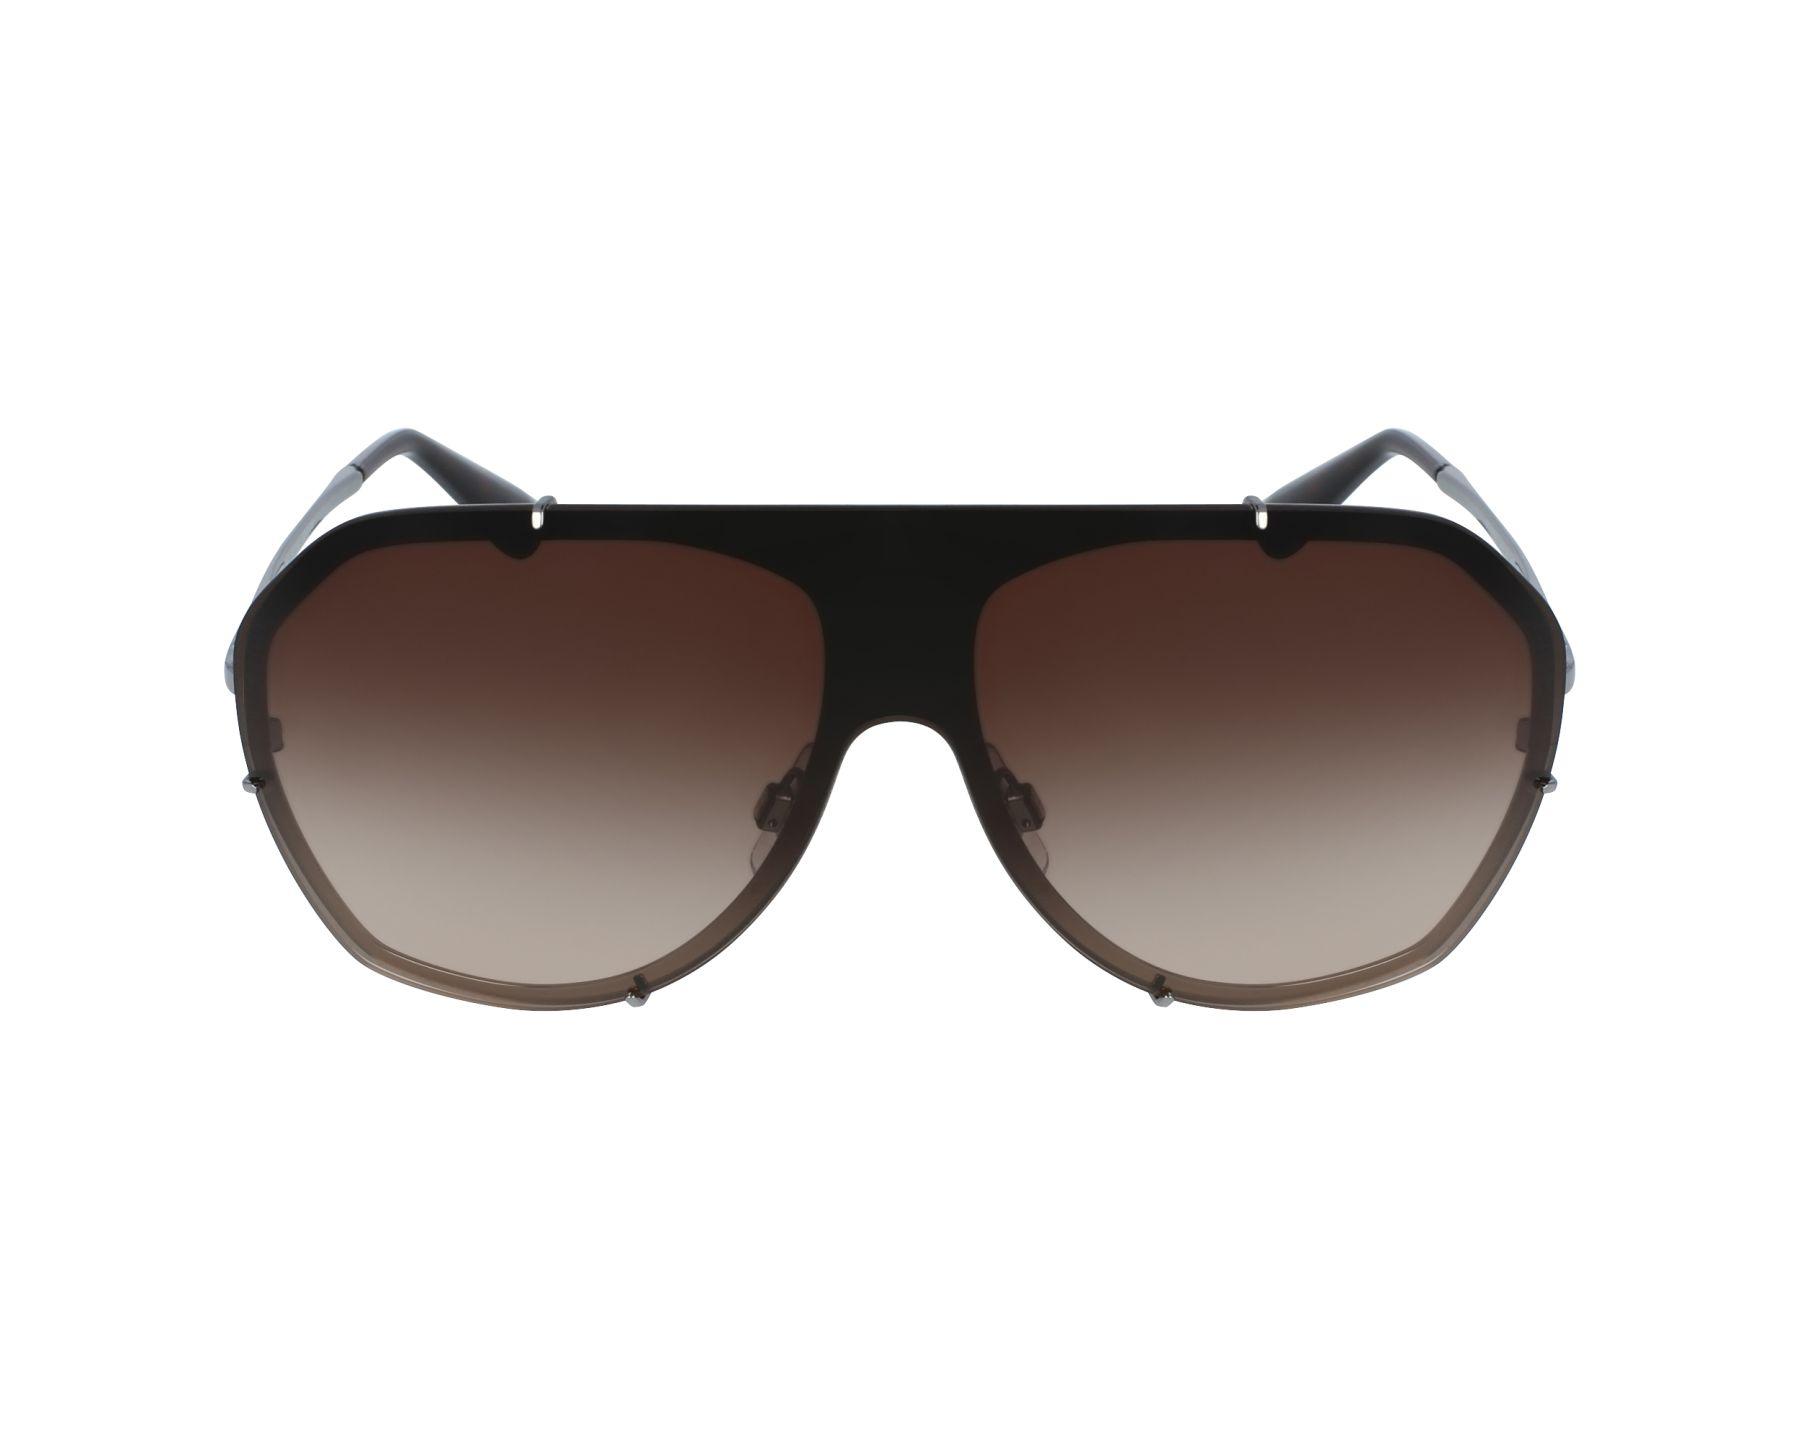 Sunglasses Dolce & Gabbana DG-2162 04/13 62-17 Silver Gun profile